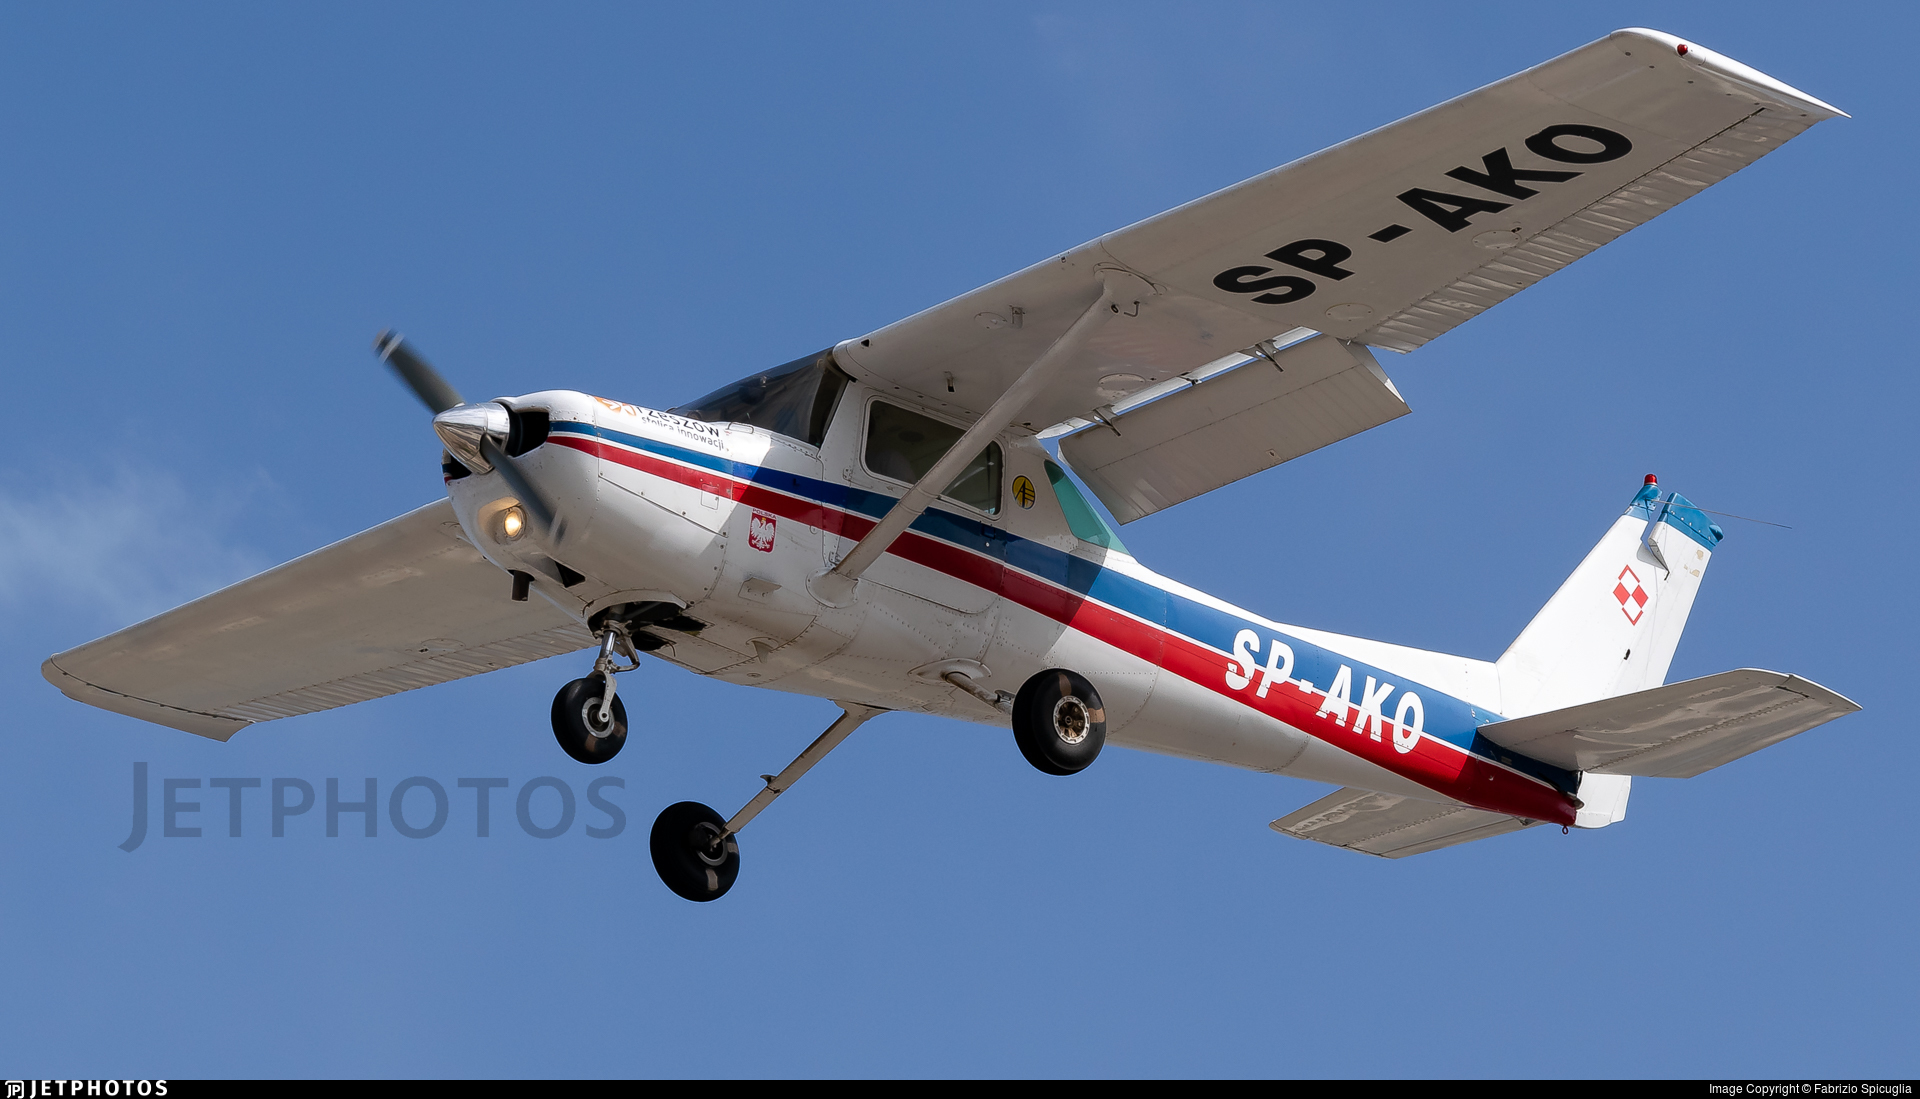 SP-AKO - Cessna 152 - Private